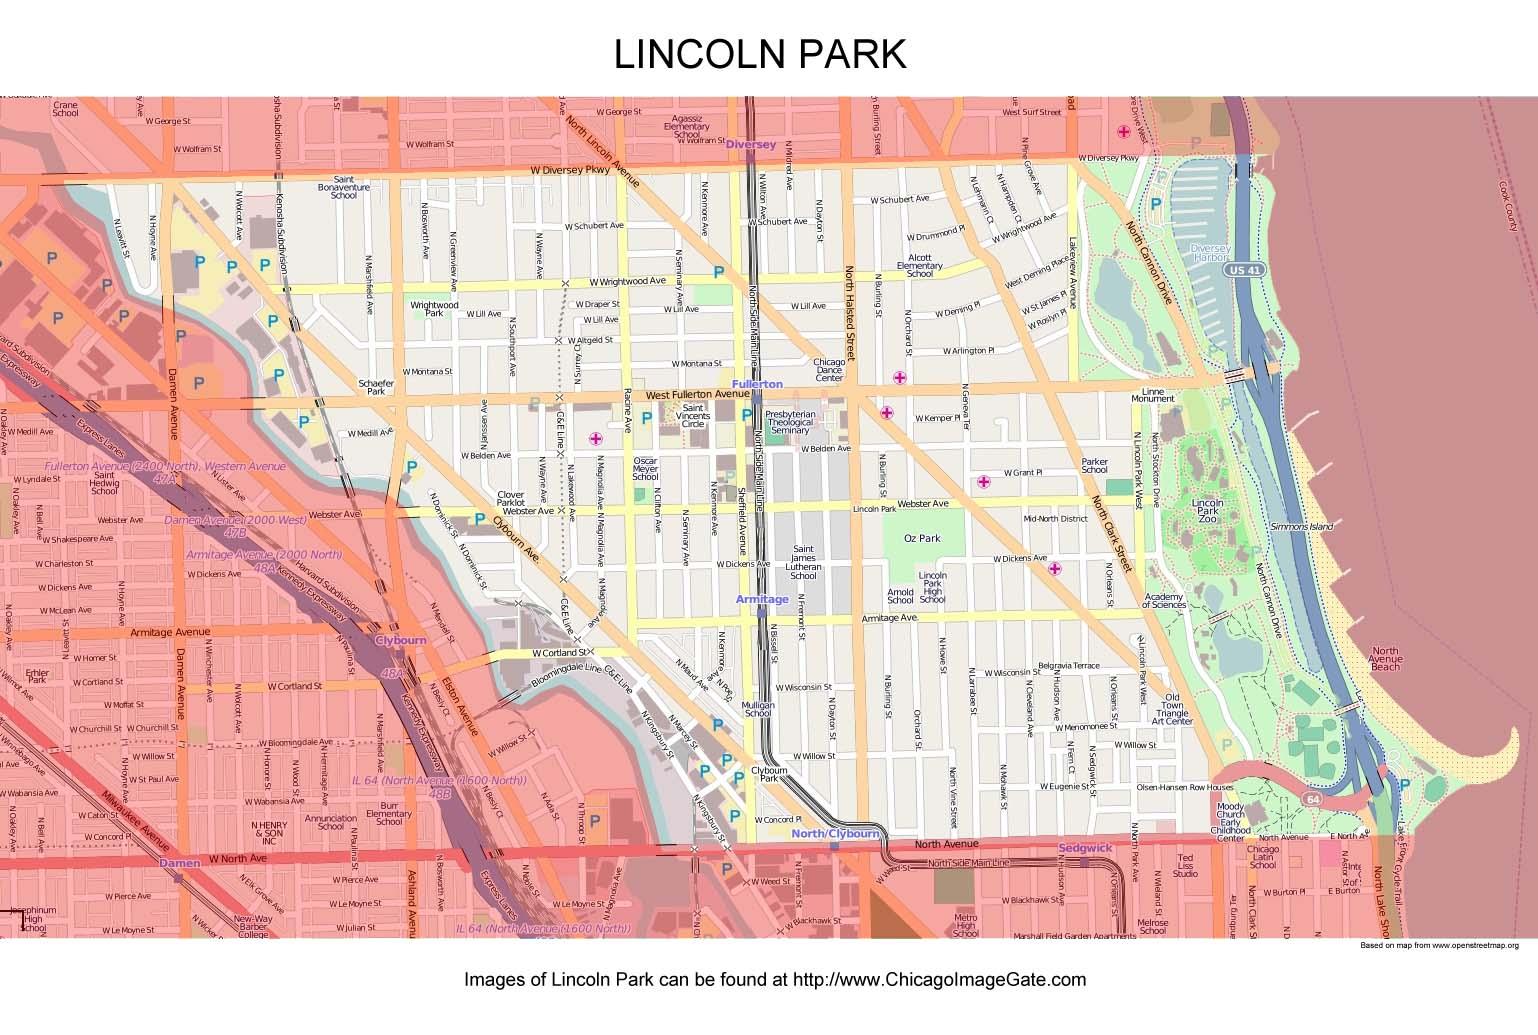 Lincoln Park Chicago Photos  Chicago Photos  Images